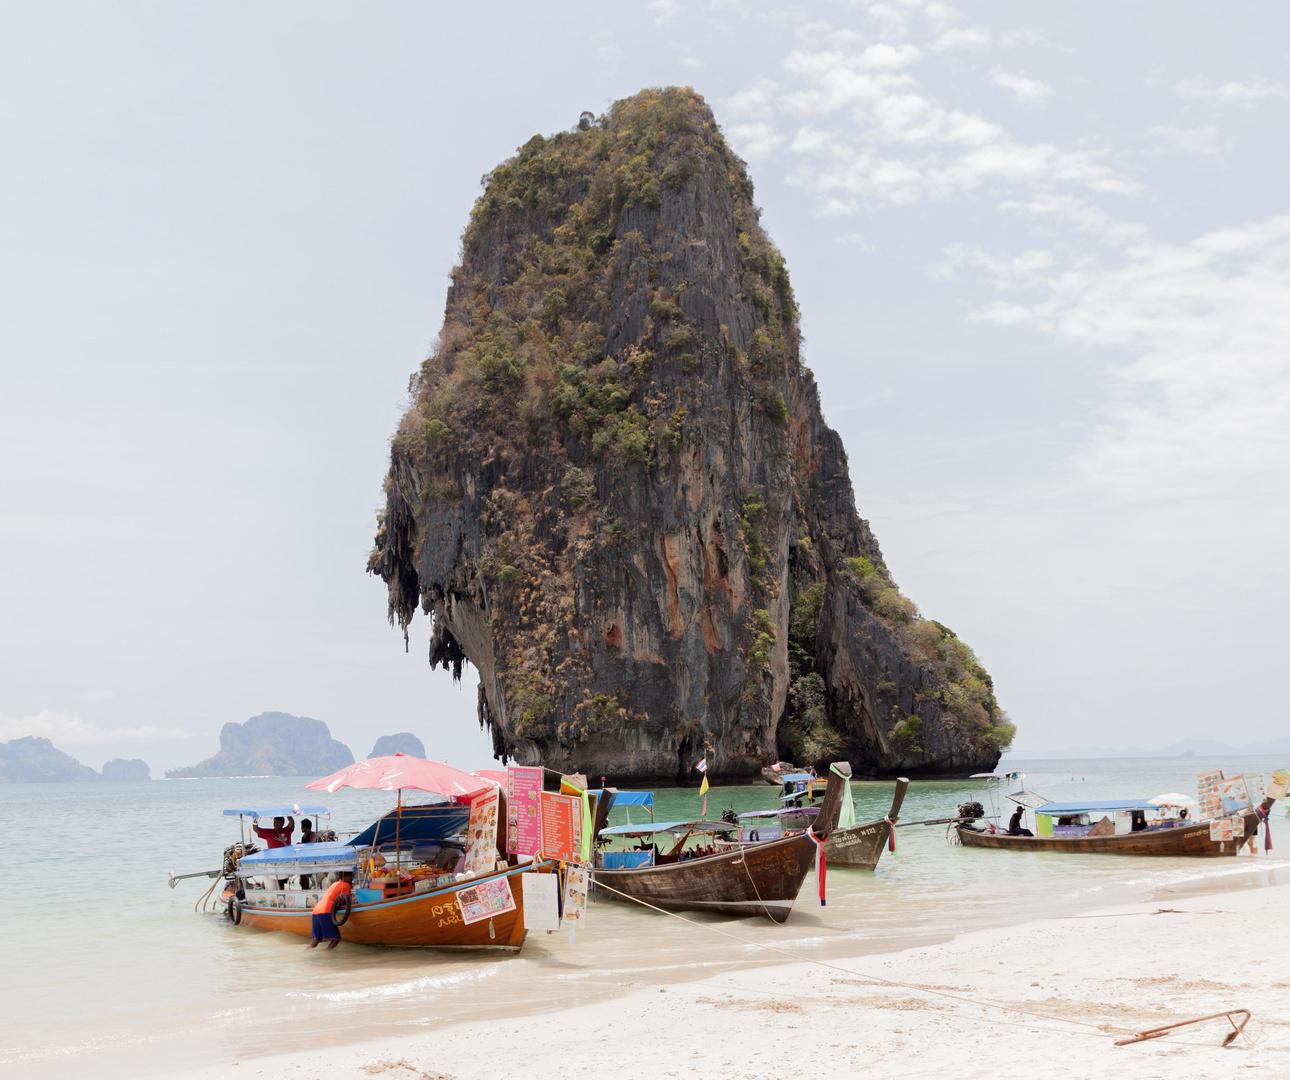 Spotmessung im grellen Licht am Phra Nang Beach